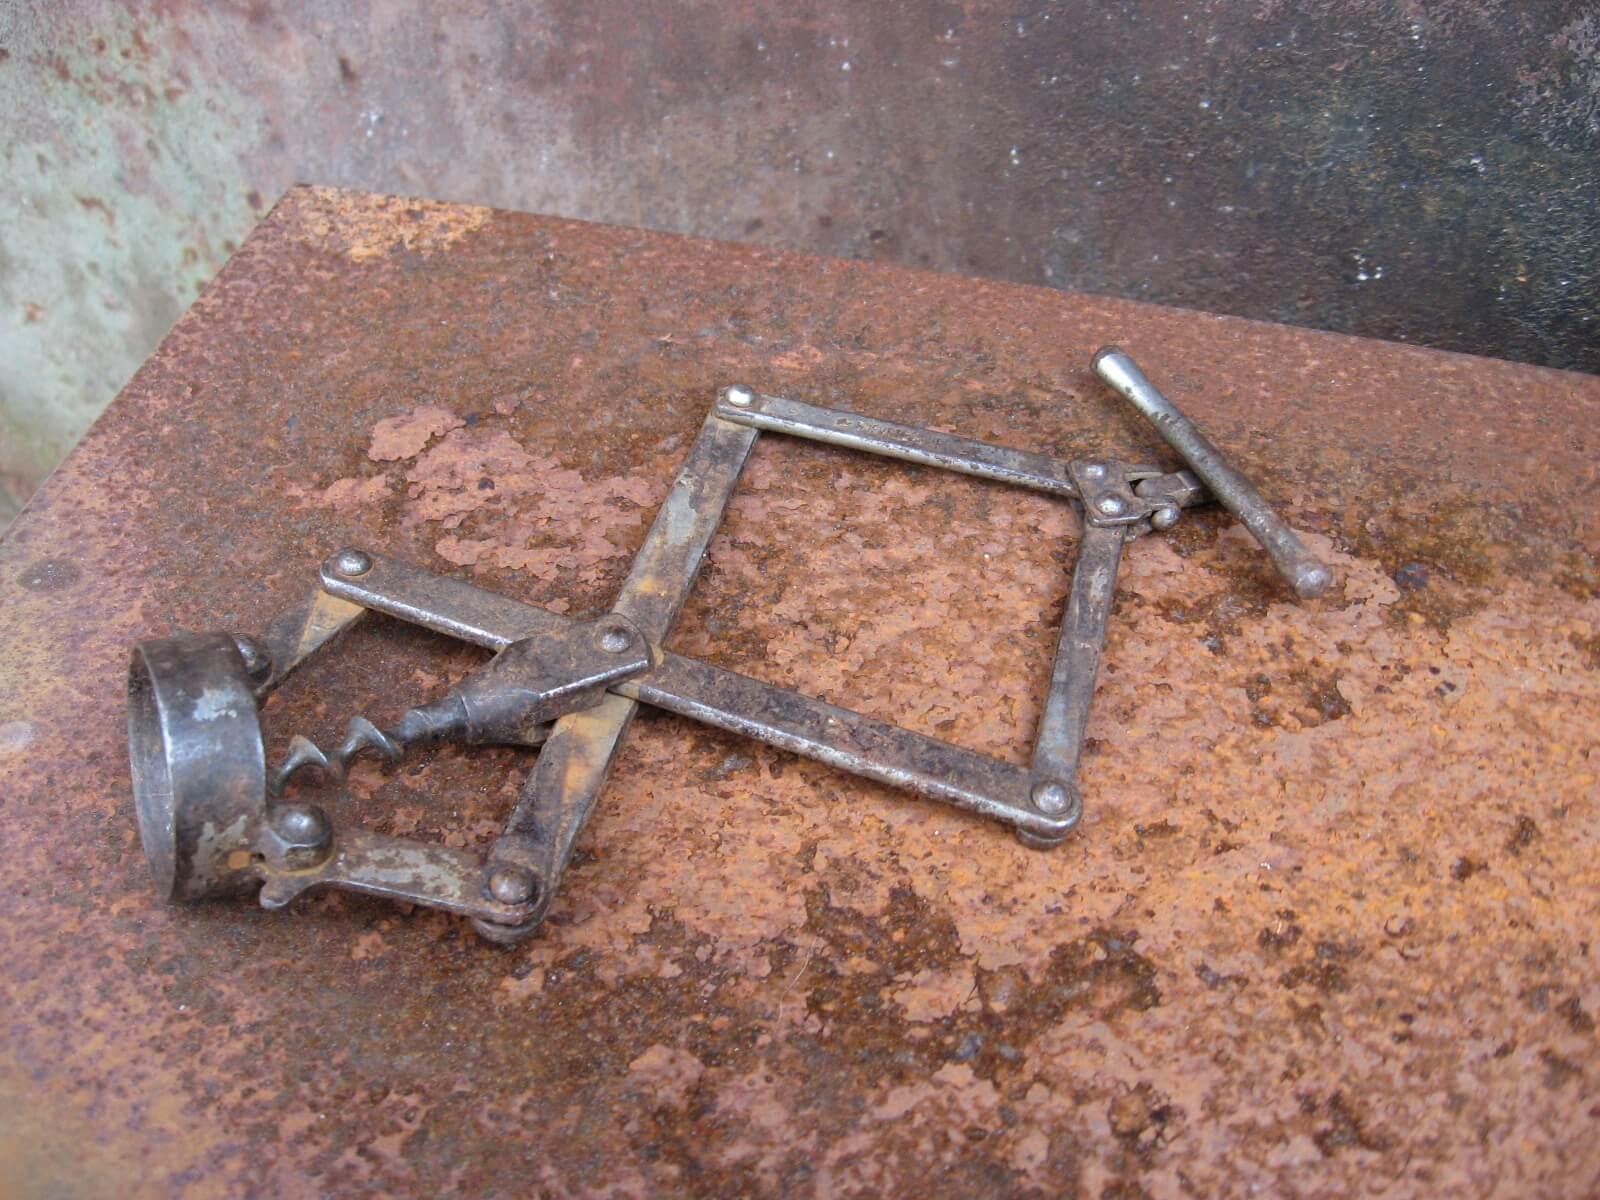 The concertina mechanical corkscrew at PumpjackPiddlewick